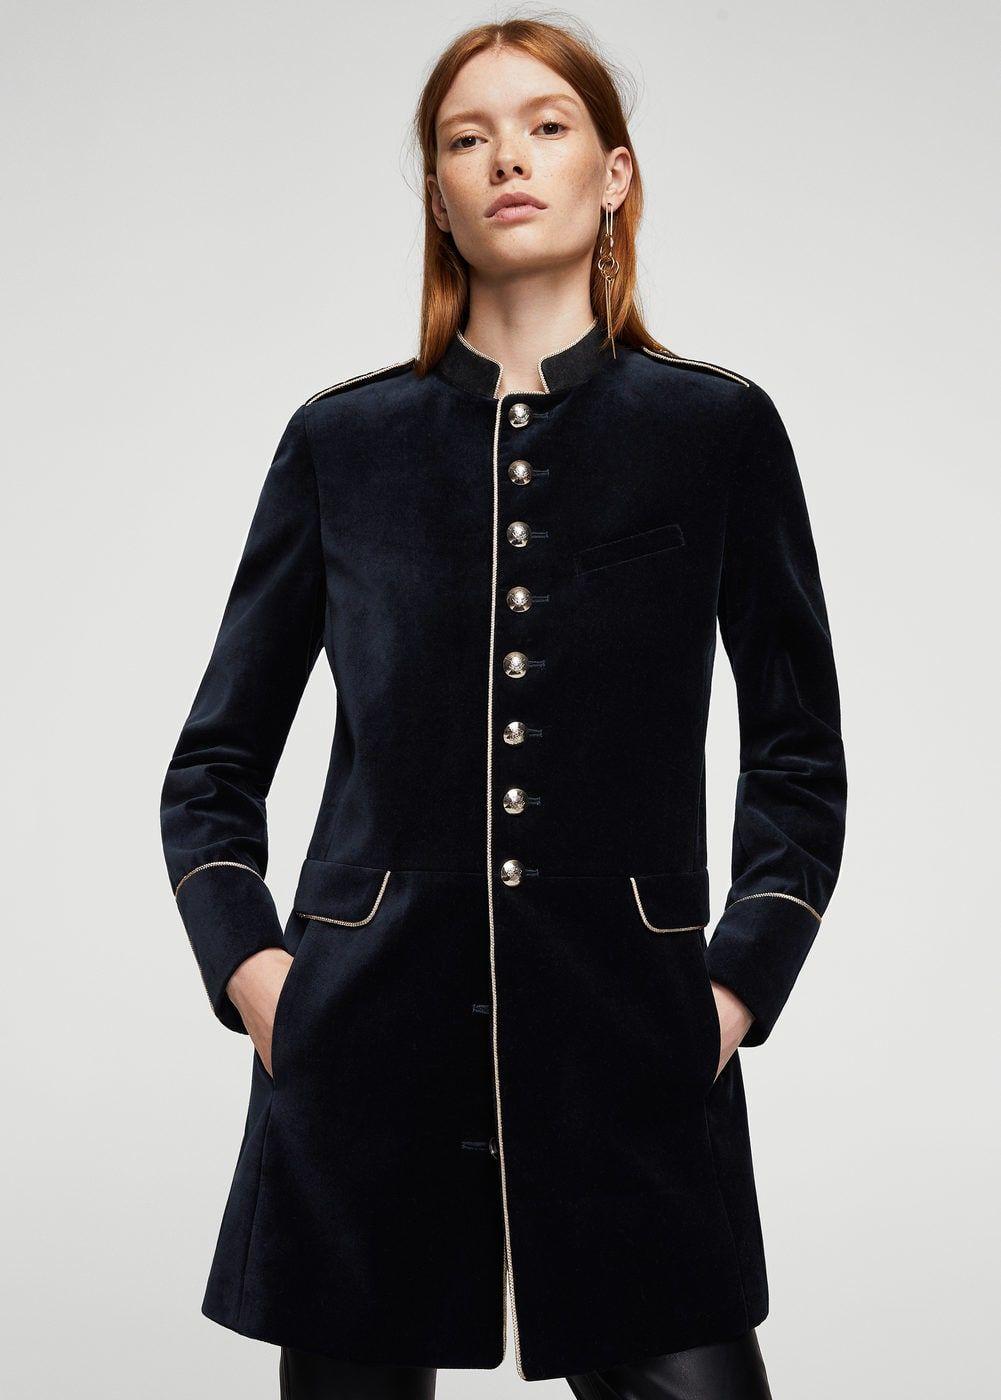 Military Style Coat Women Mango United Kingdom Military Fashion Military Style Coats Coats For Women [ 1400 x 1001 Pixel ]